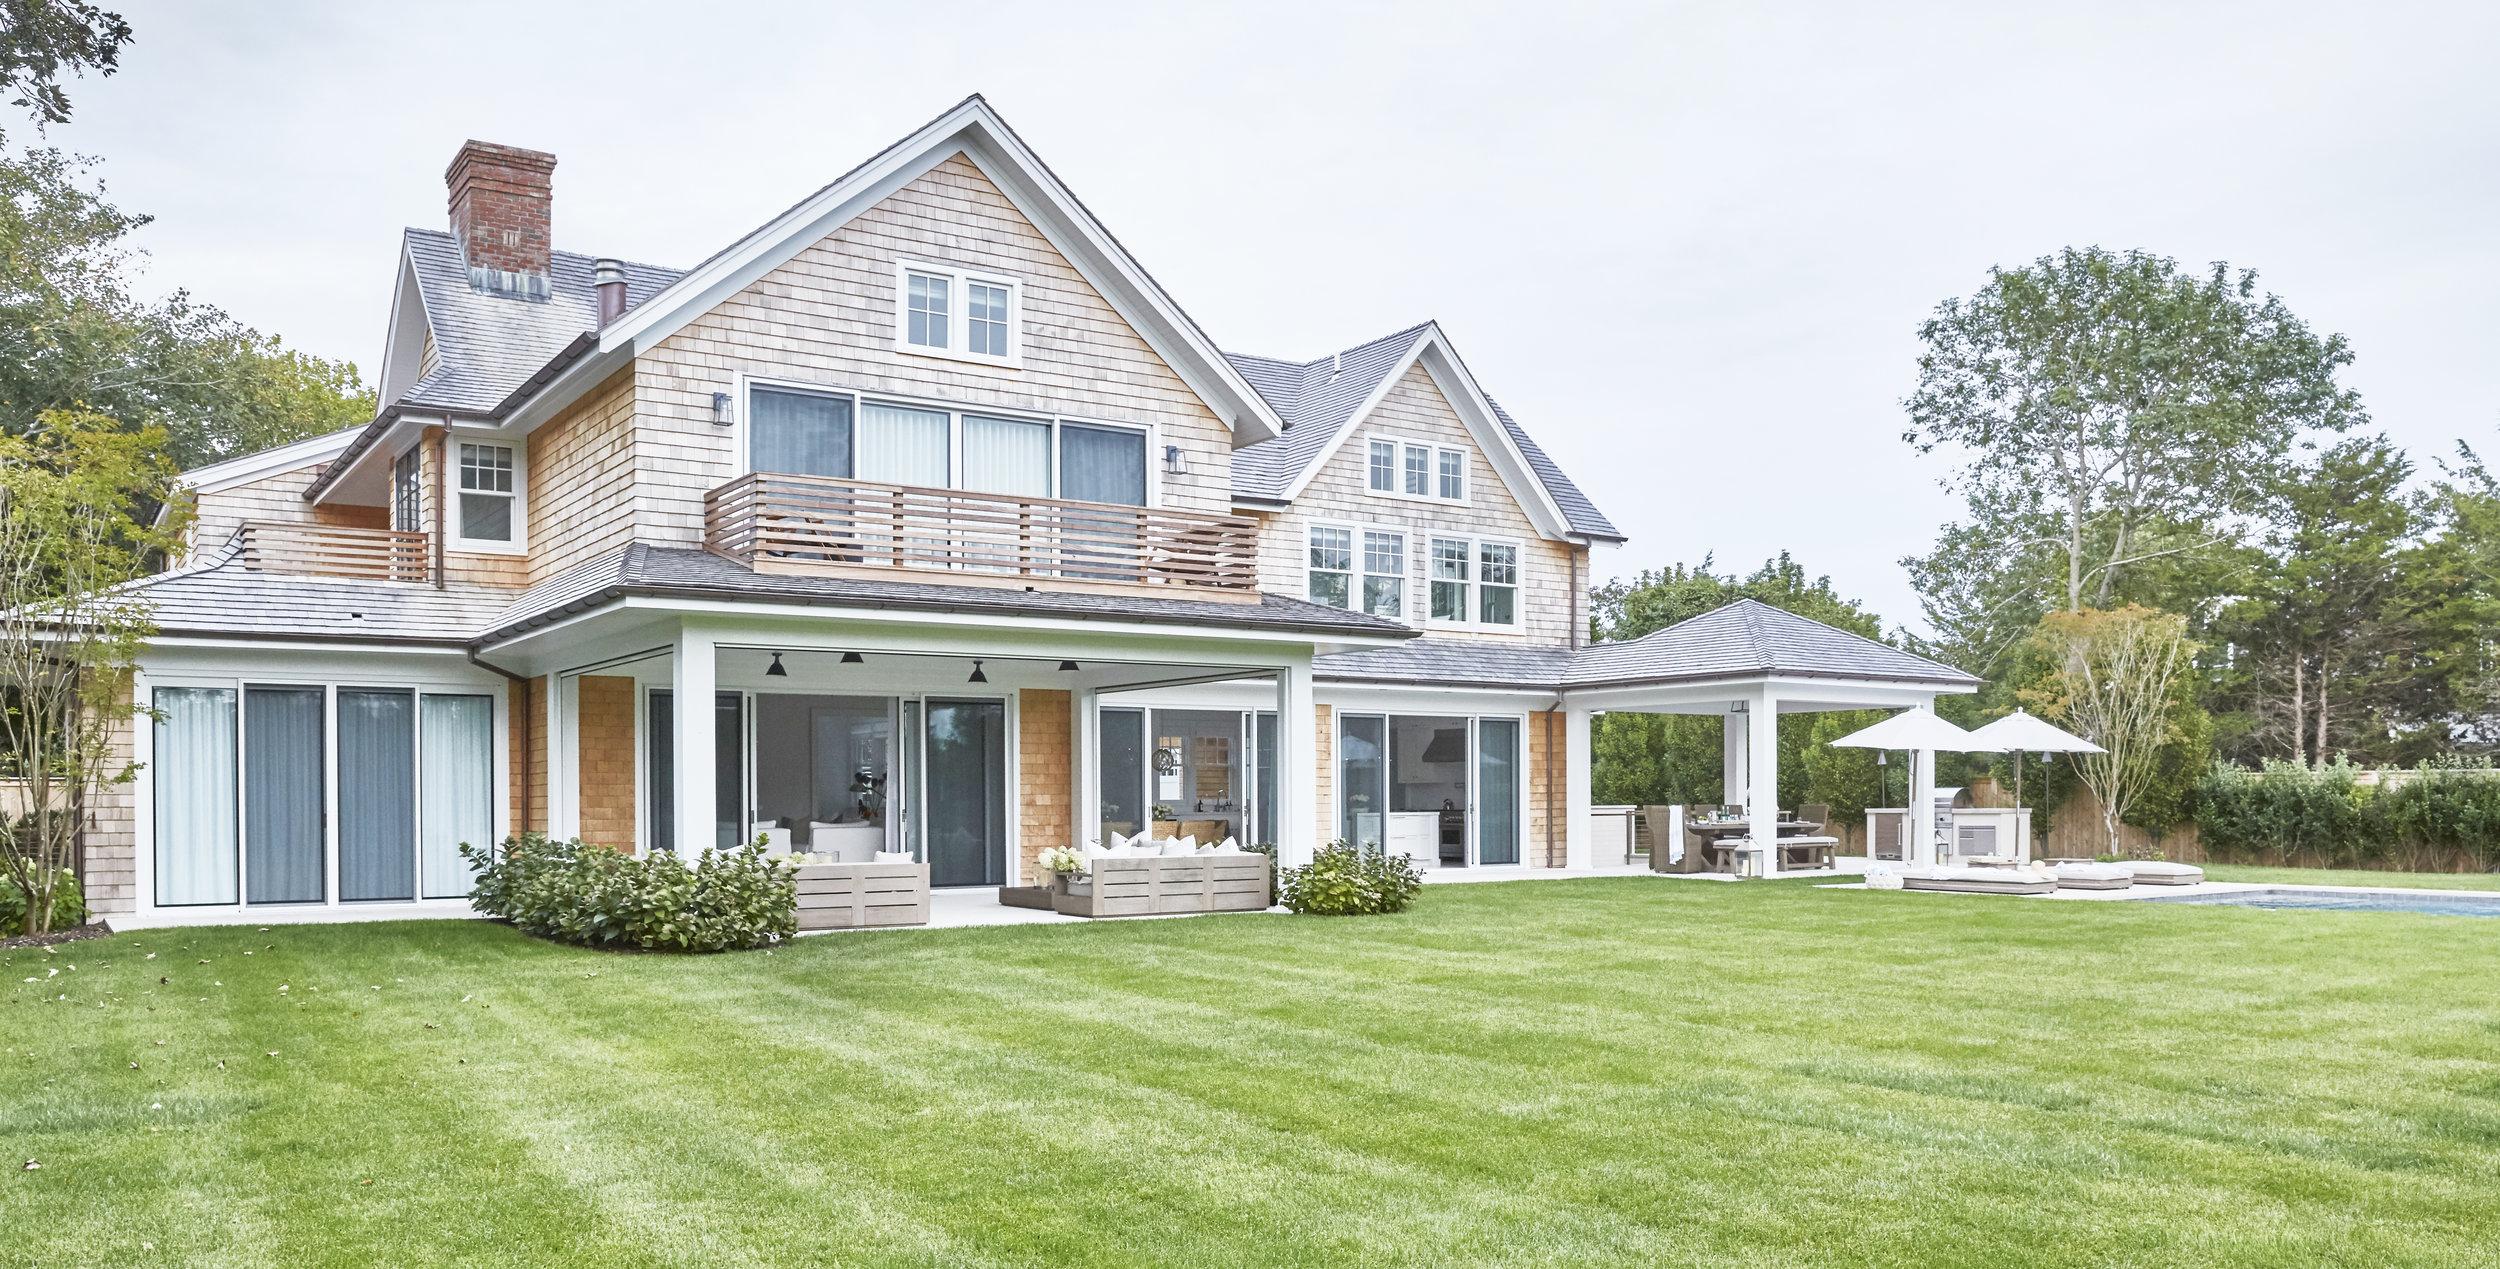 25. Amagansett Beach House by Chango & Co.jpg